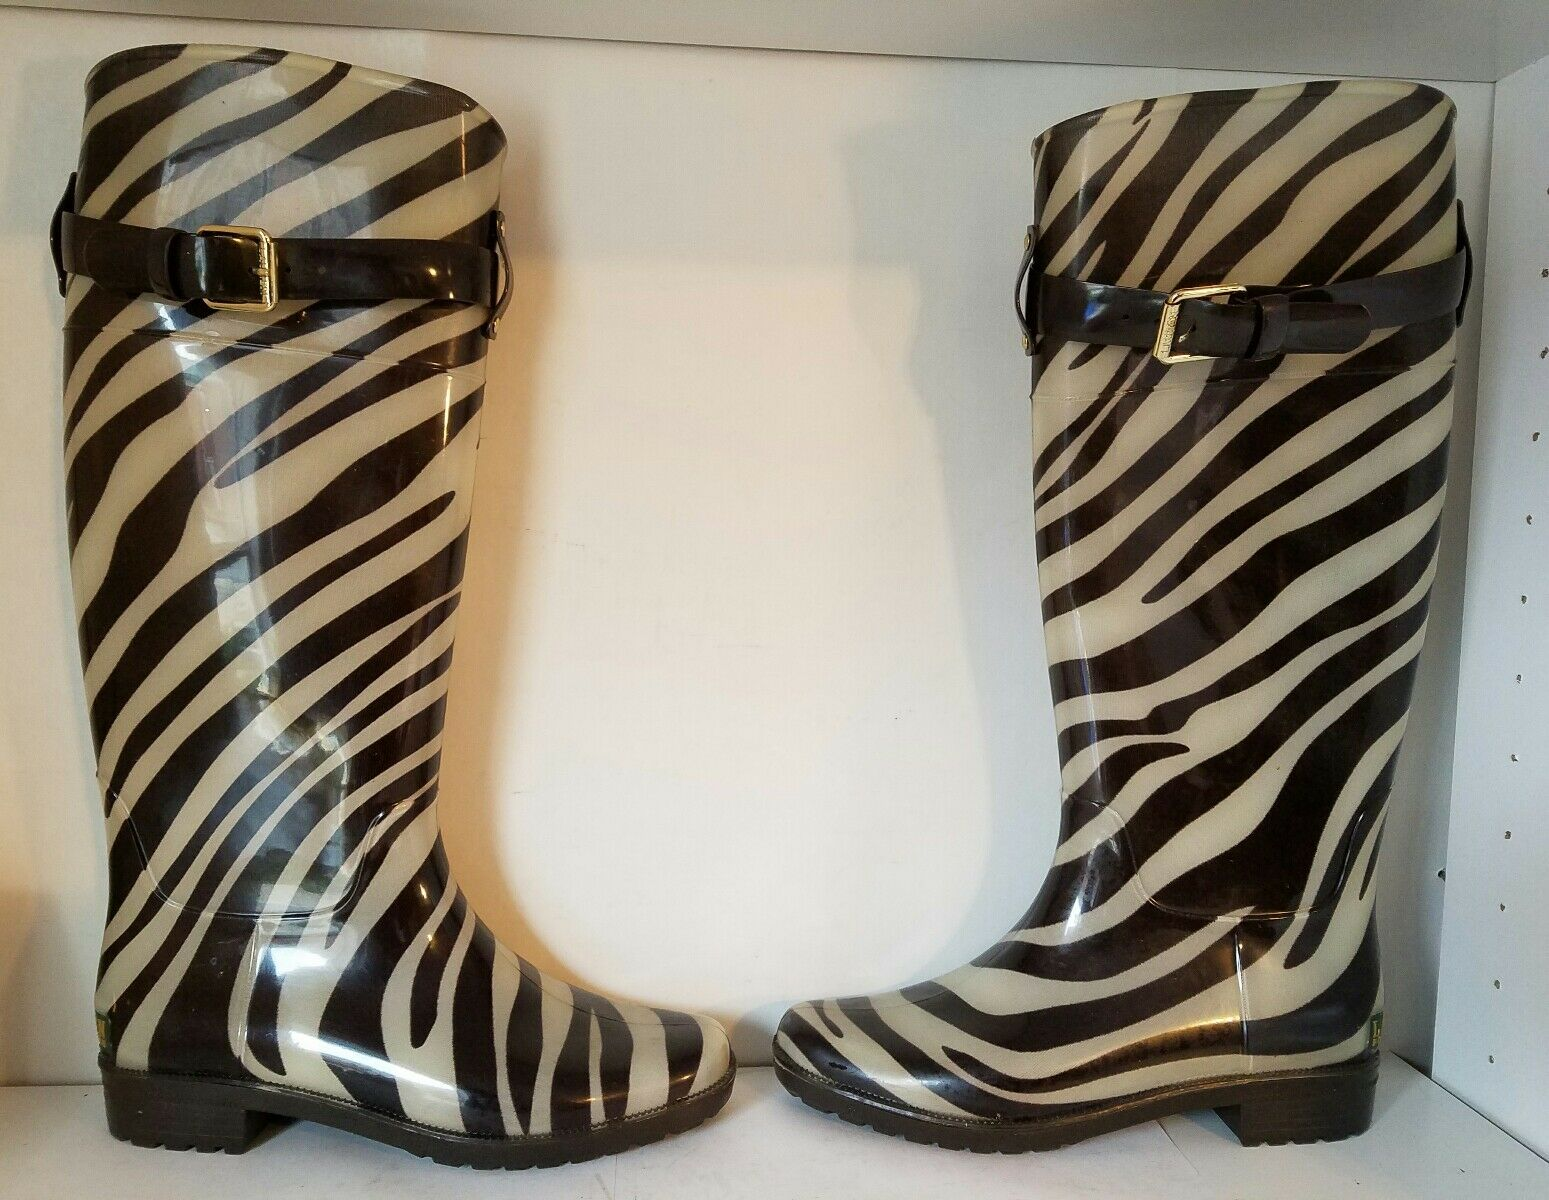 RALPH LAUREN WOMEN'S Knee High Rubber RAIN BOOTSBROWN ZEBRA PRINTSz 6